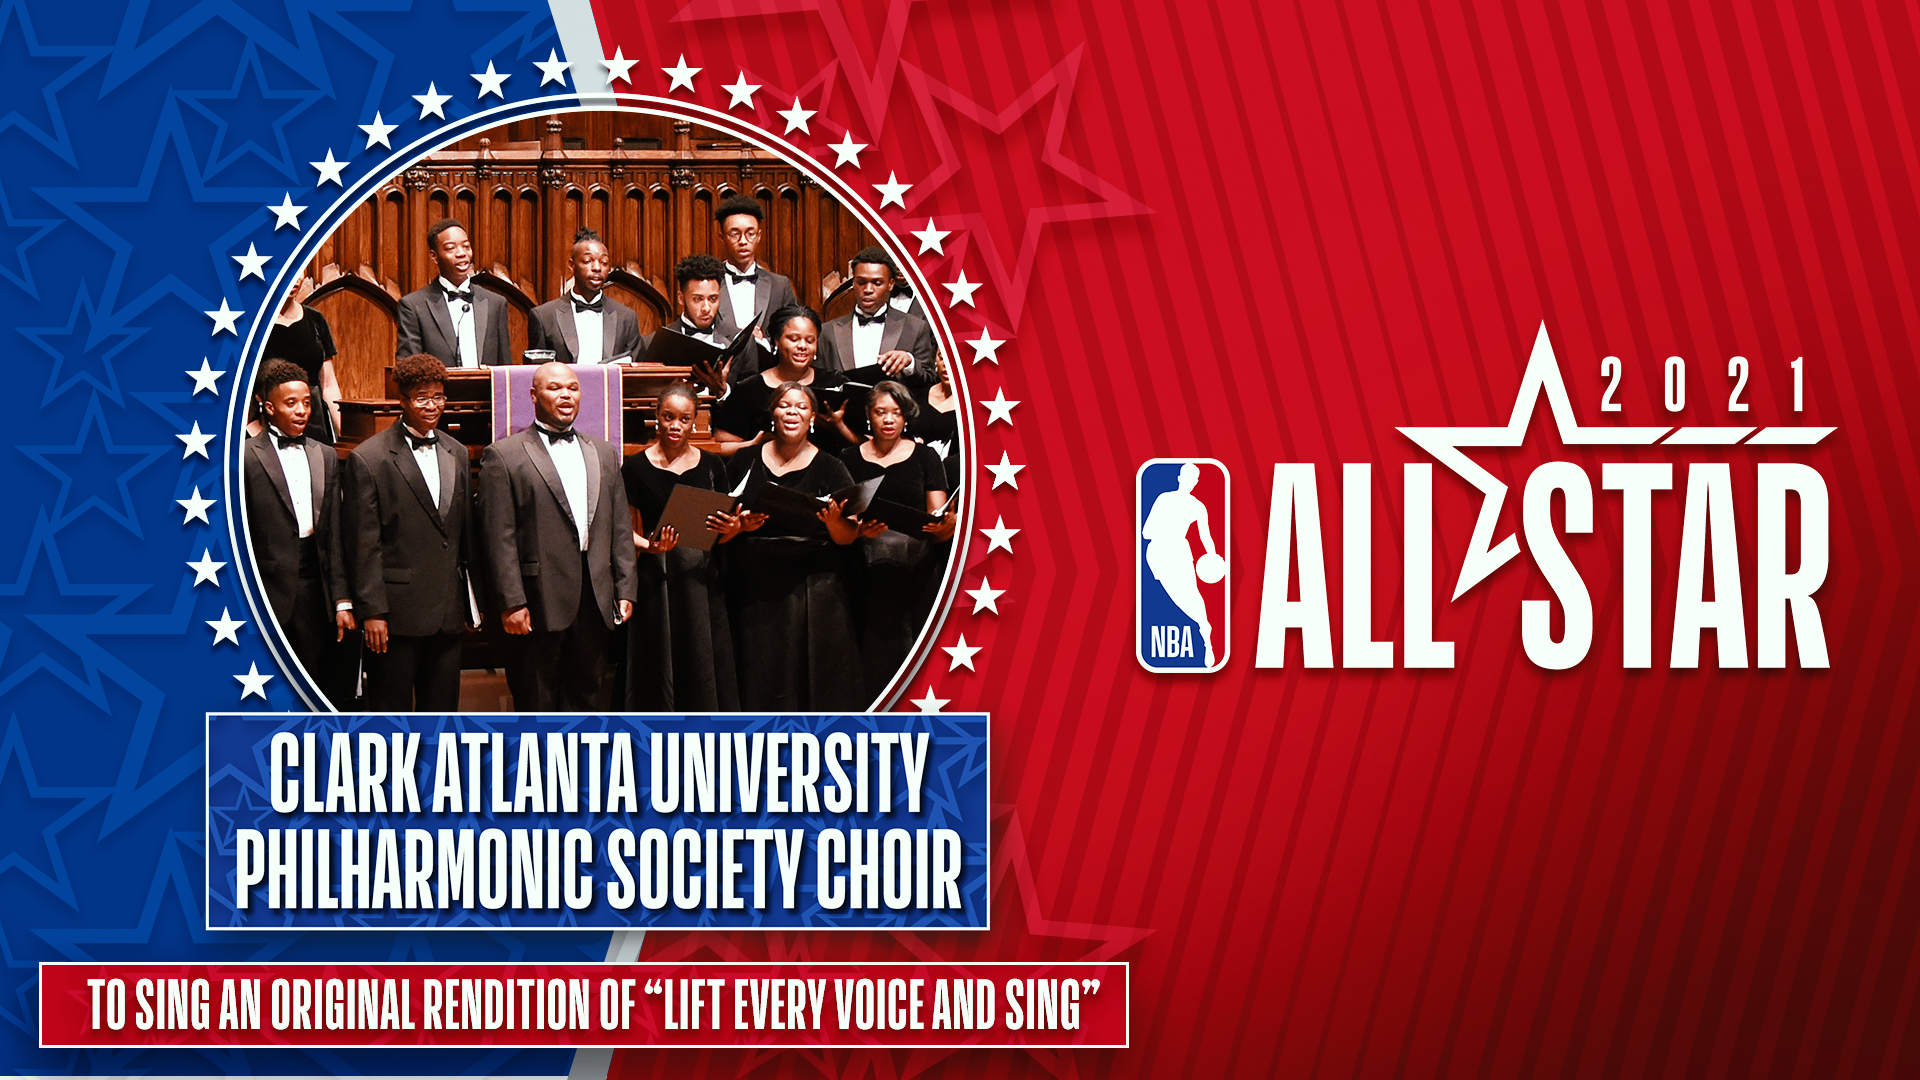 Clark Atlanta University Philharmonic Society Choir